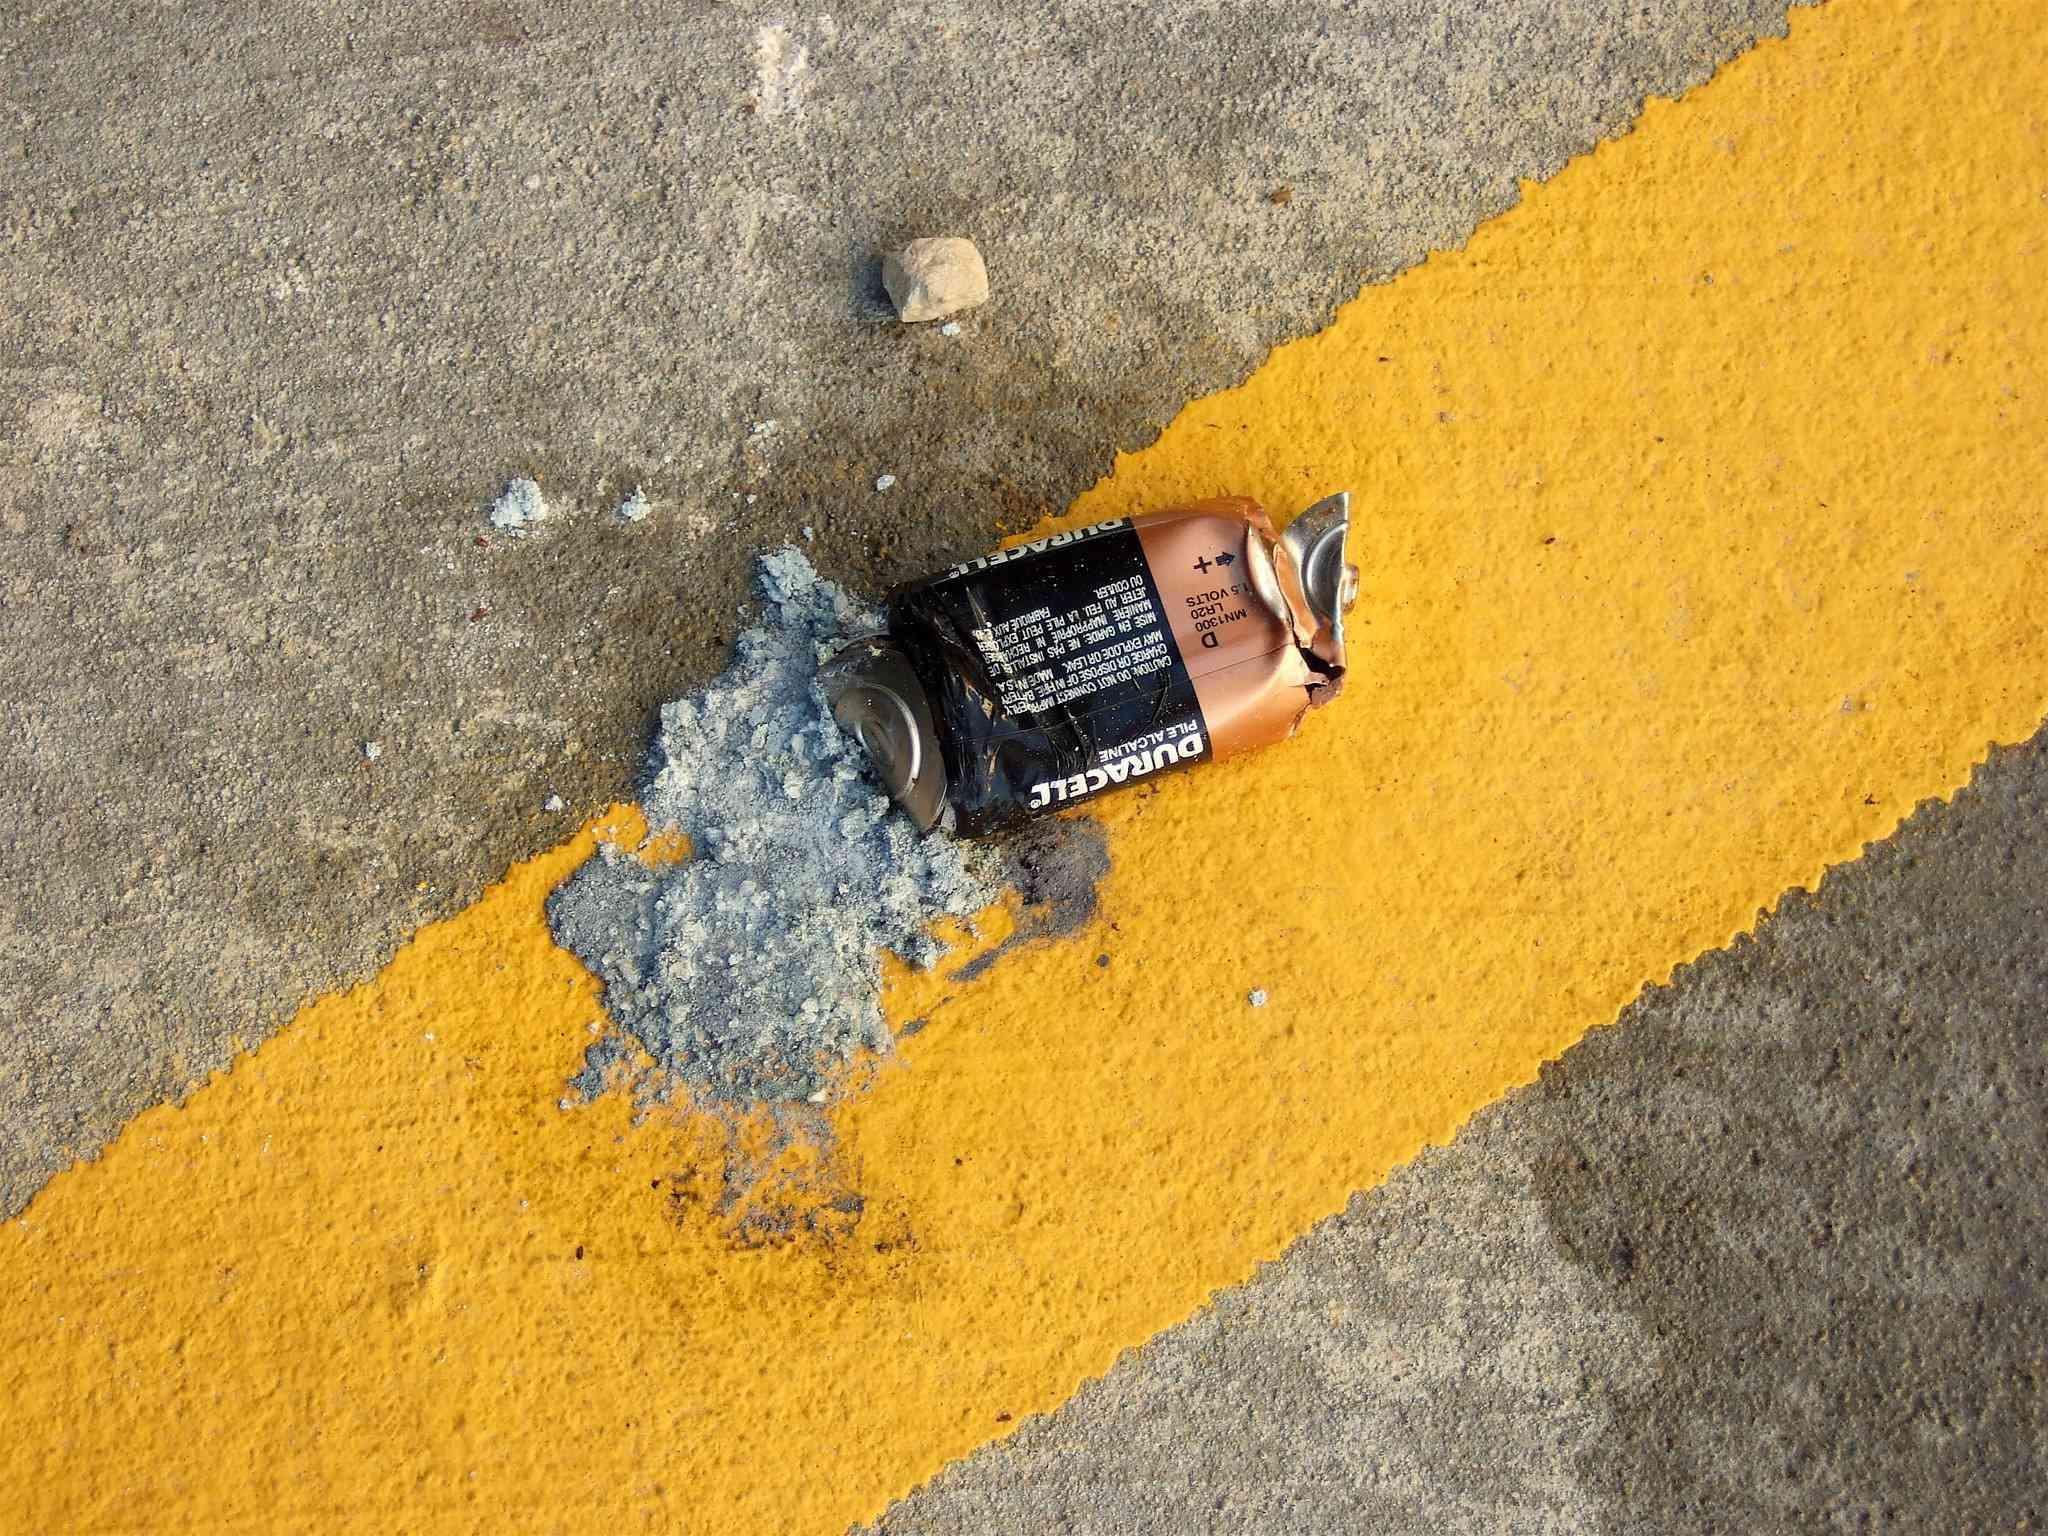 a smushed battery split open on ground